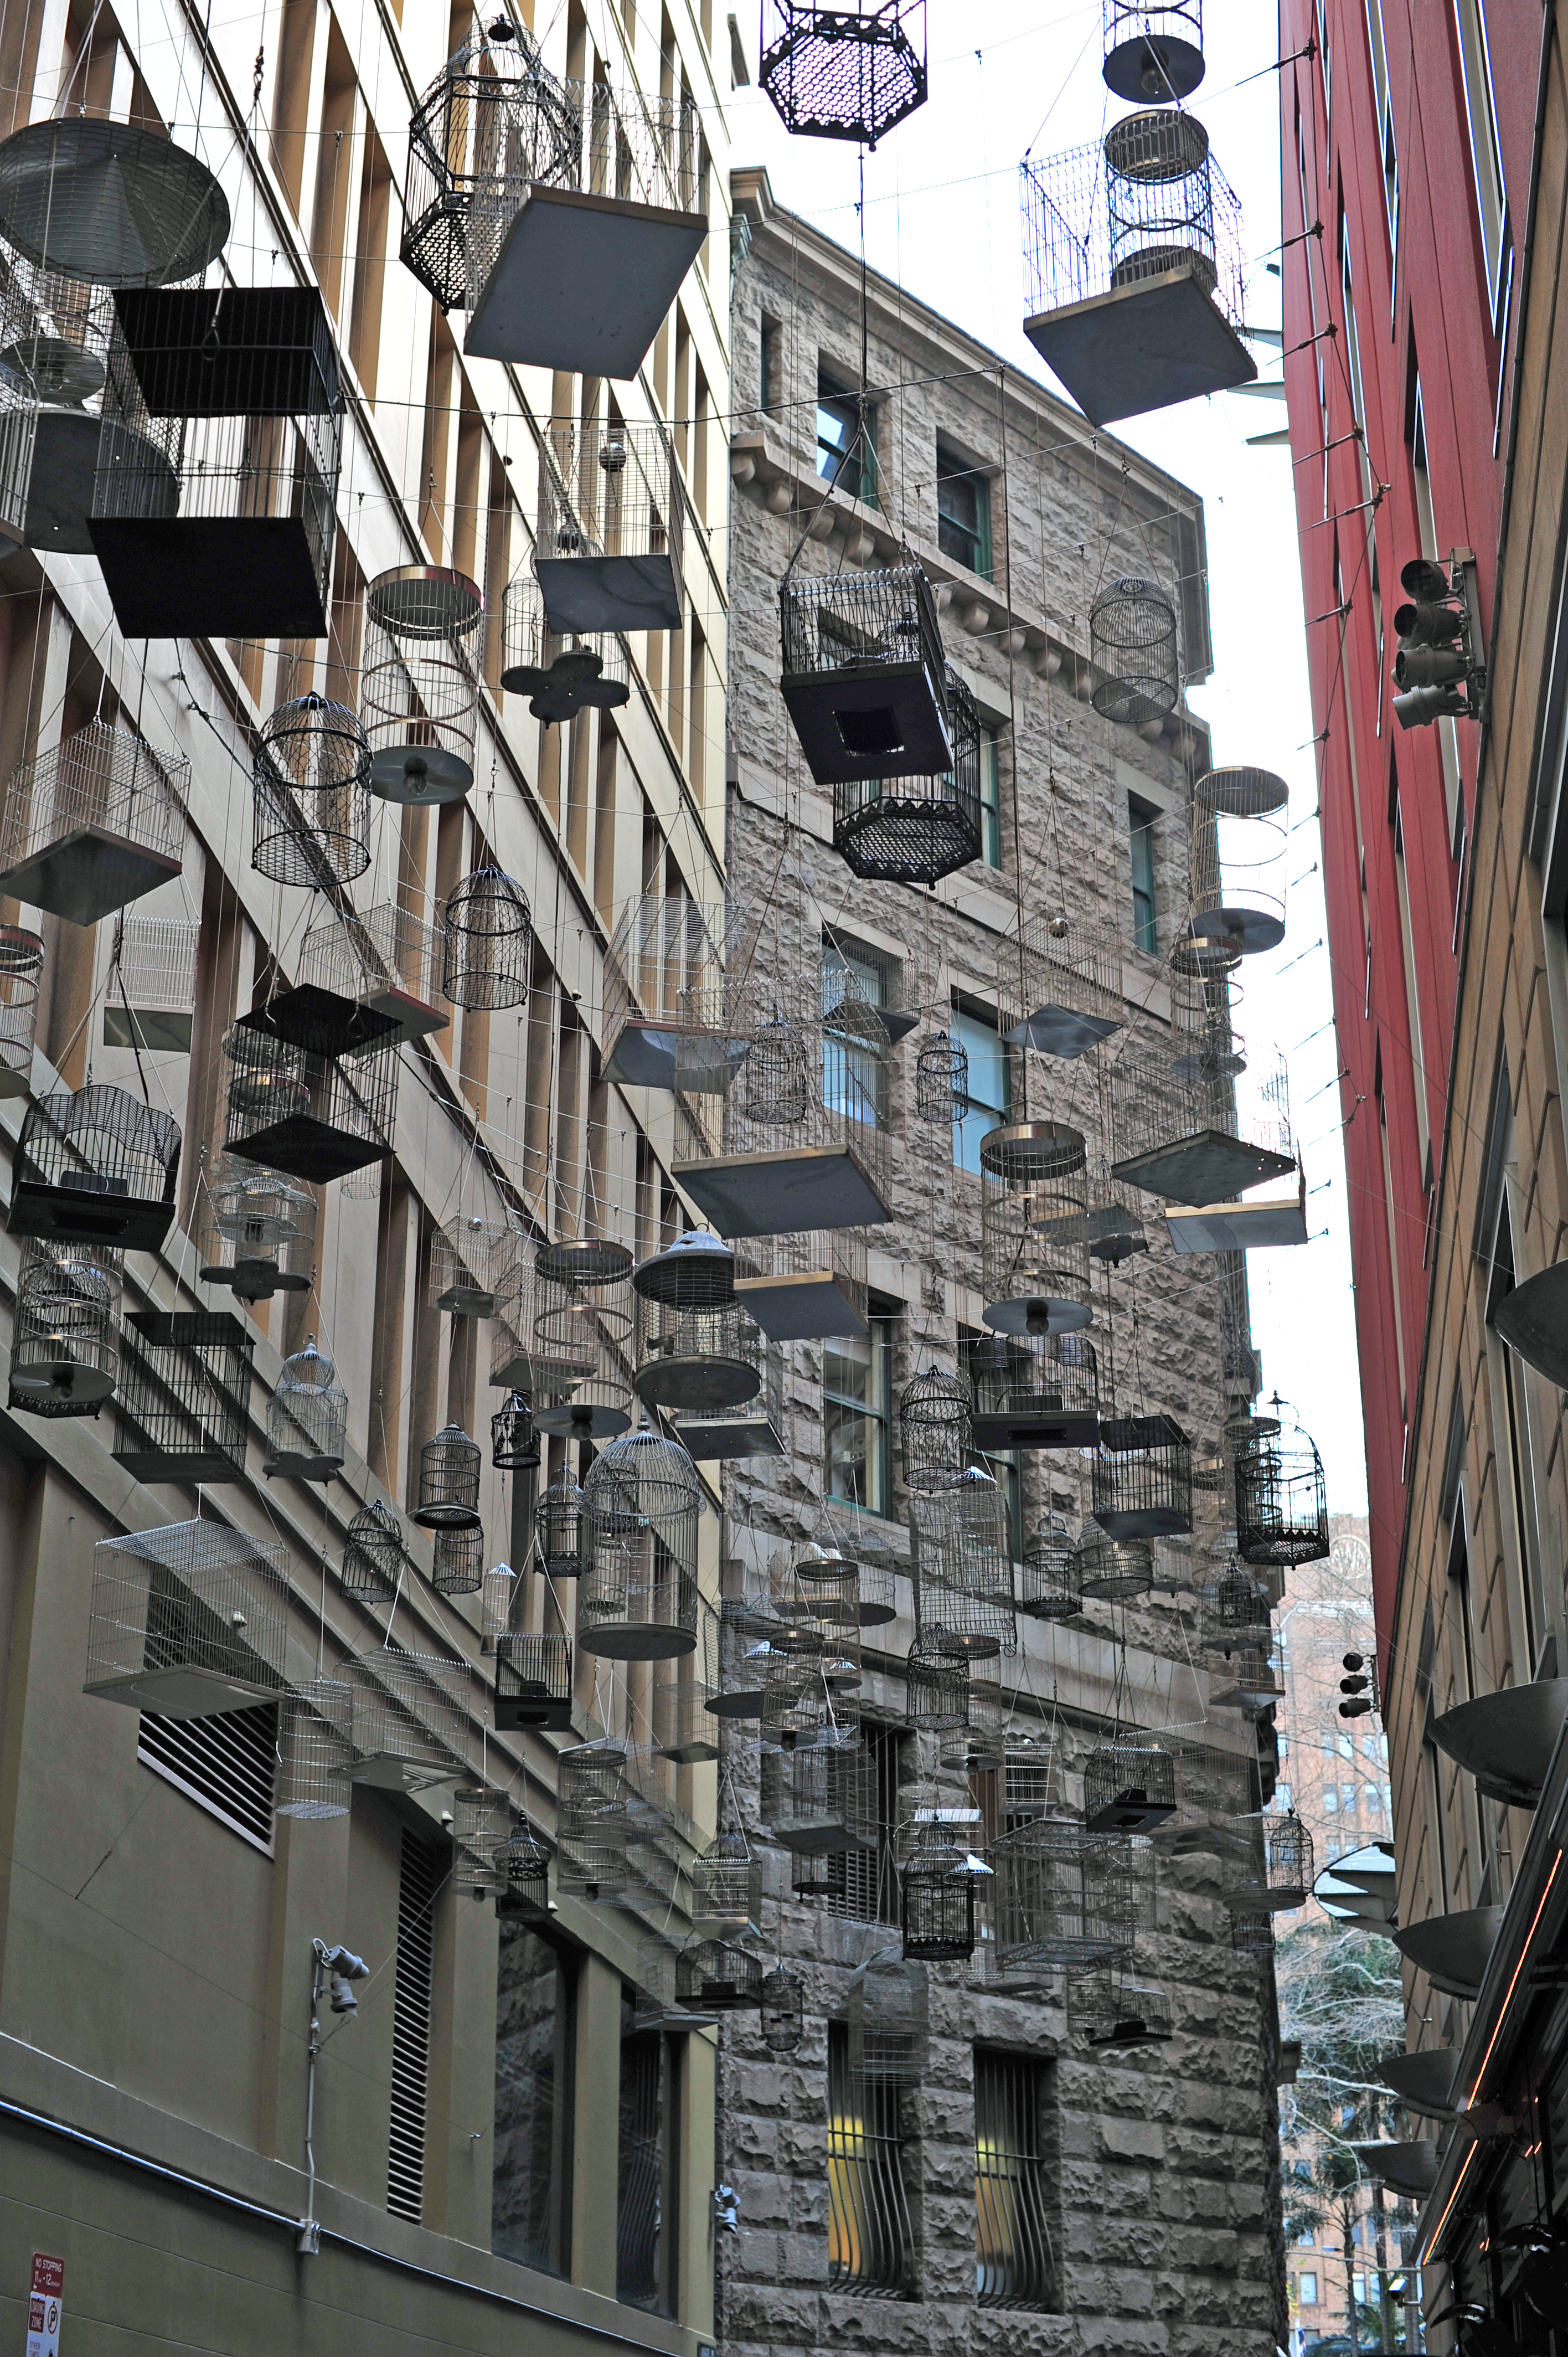 Bird cages sculpture